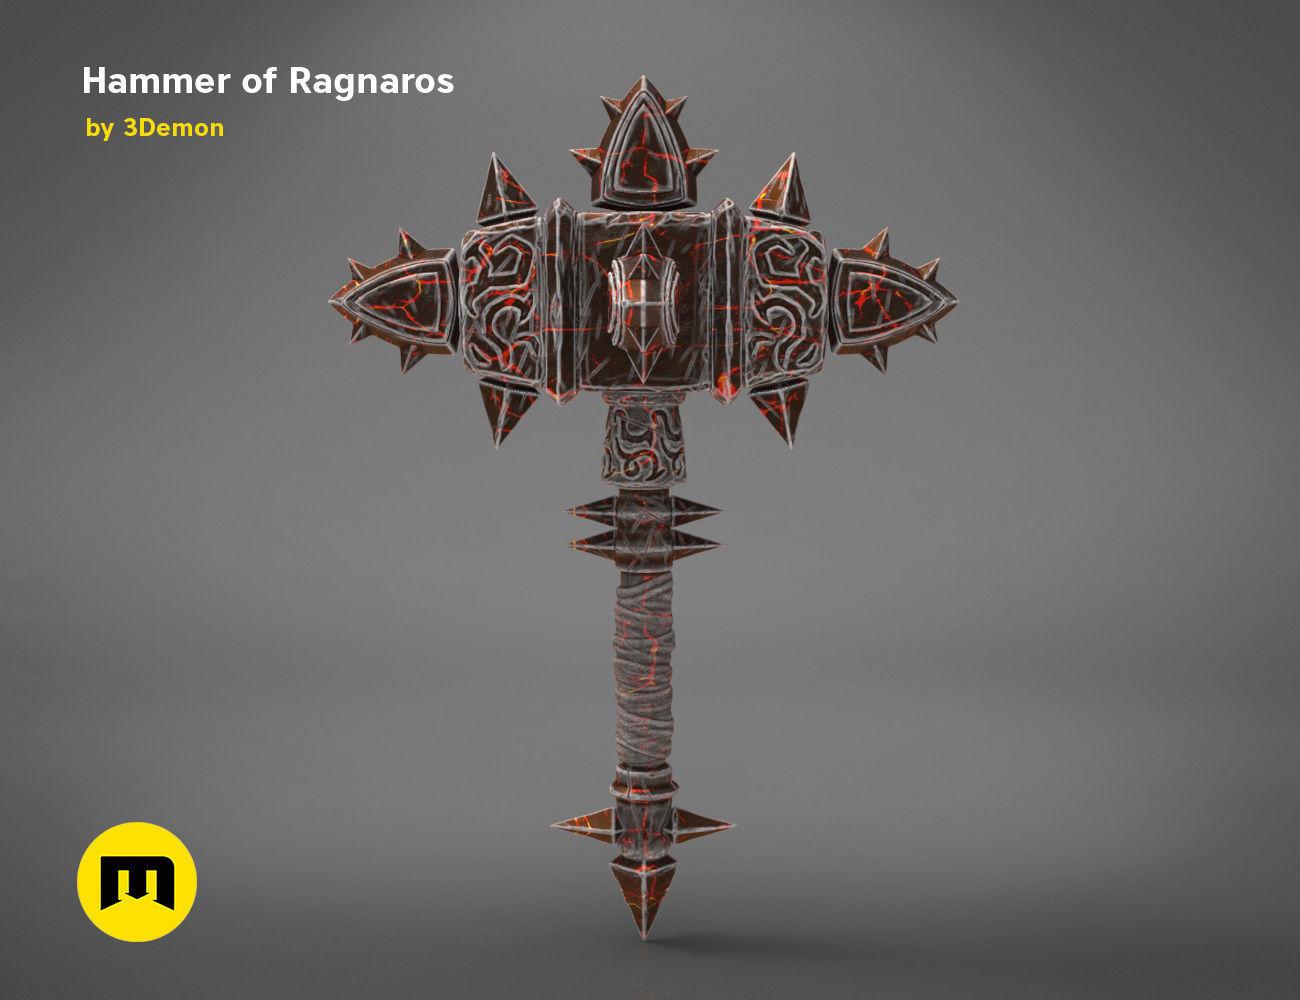 Hammer of Ragnaros - World of Warcraft